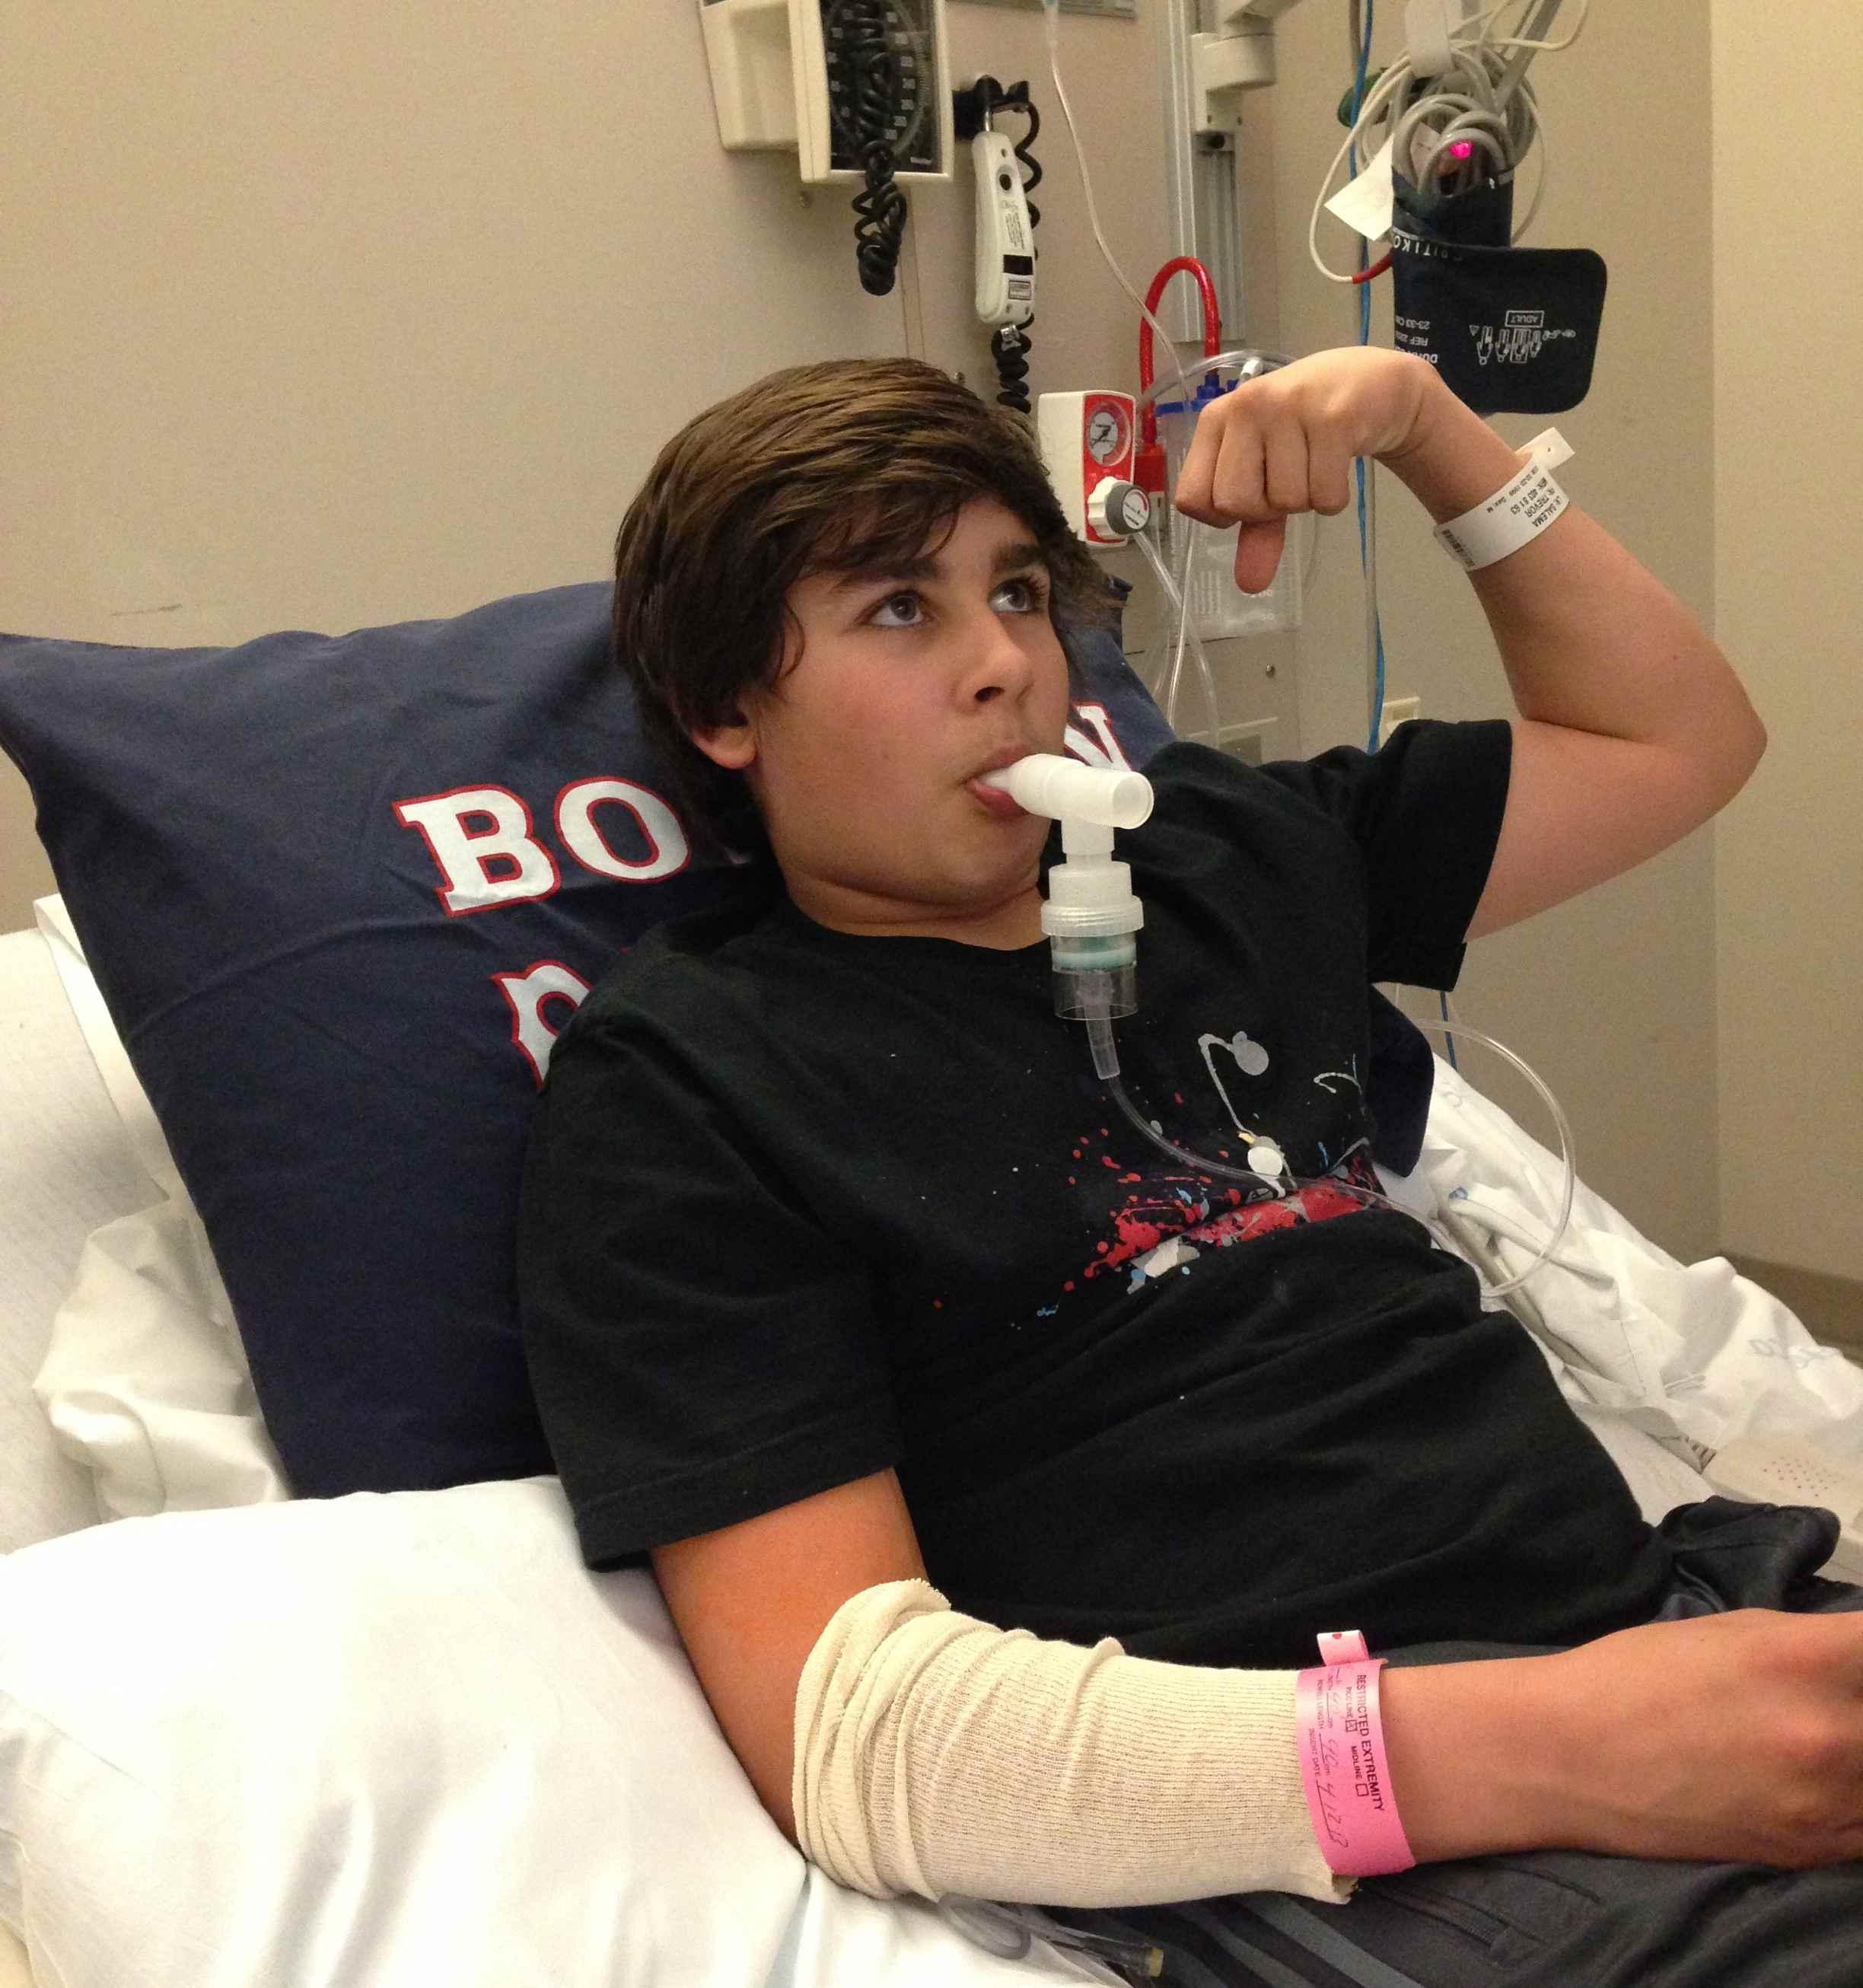 Trevor in the hospital